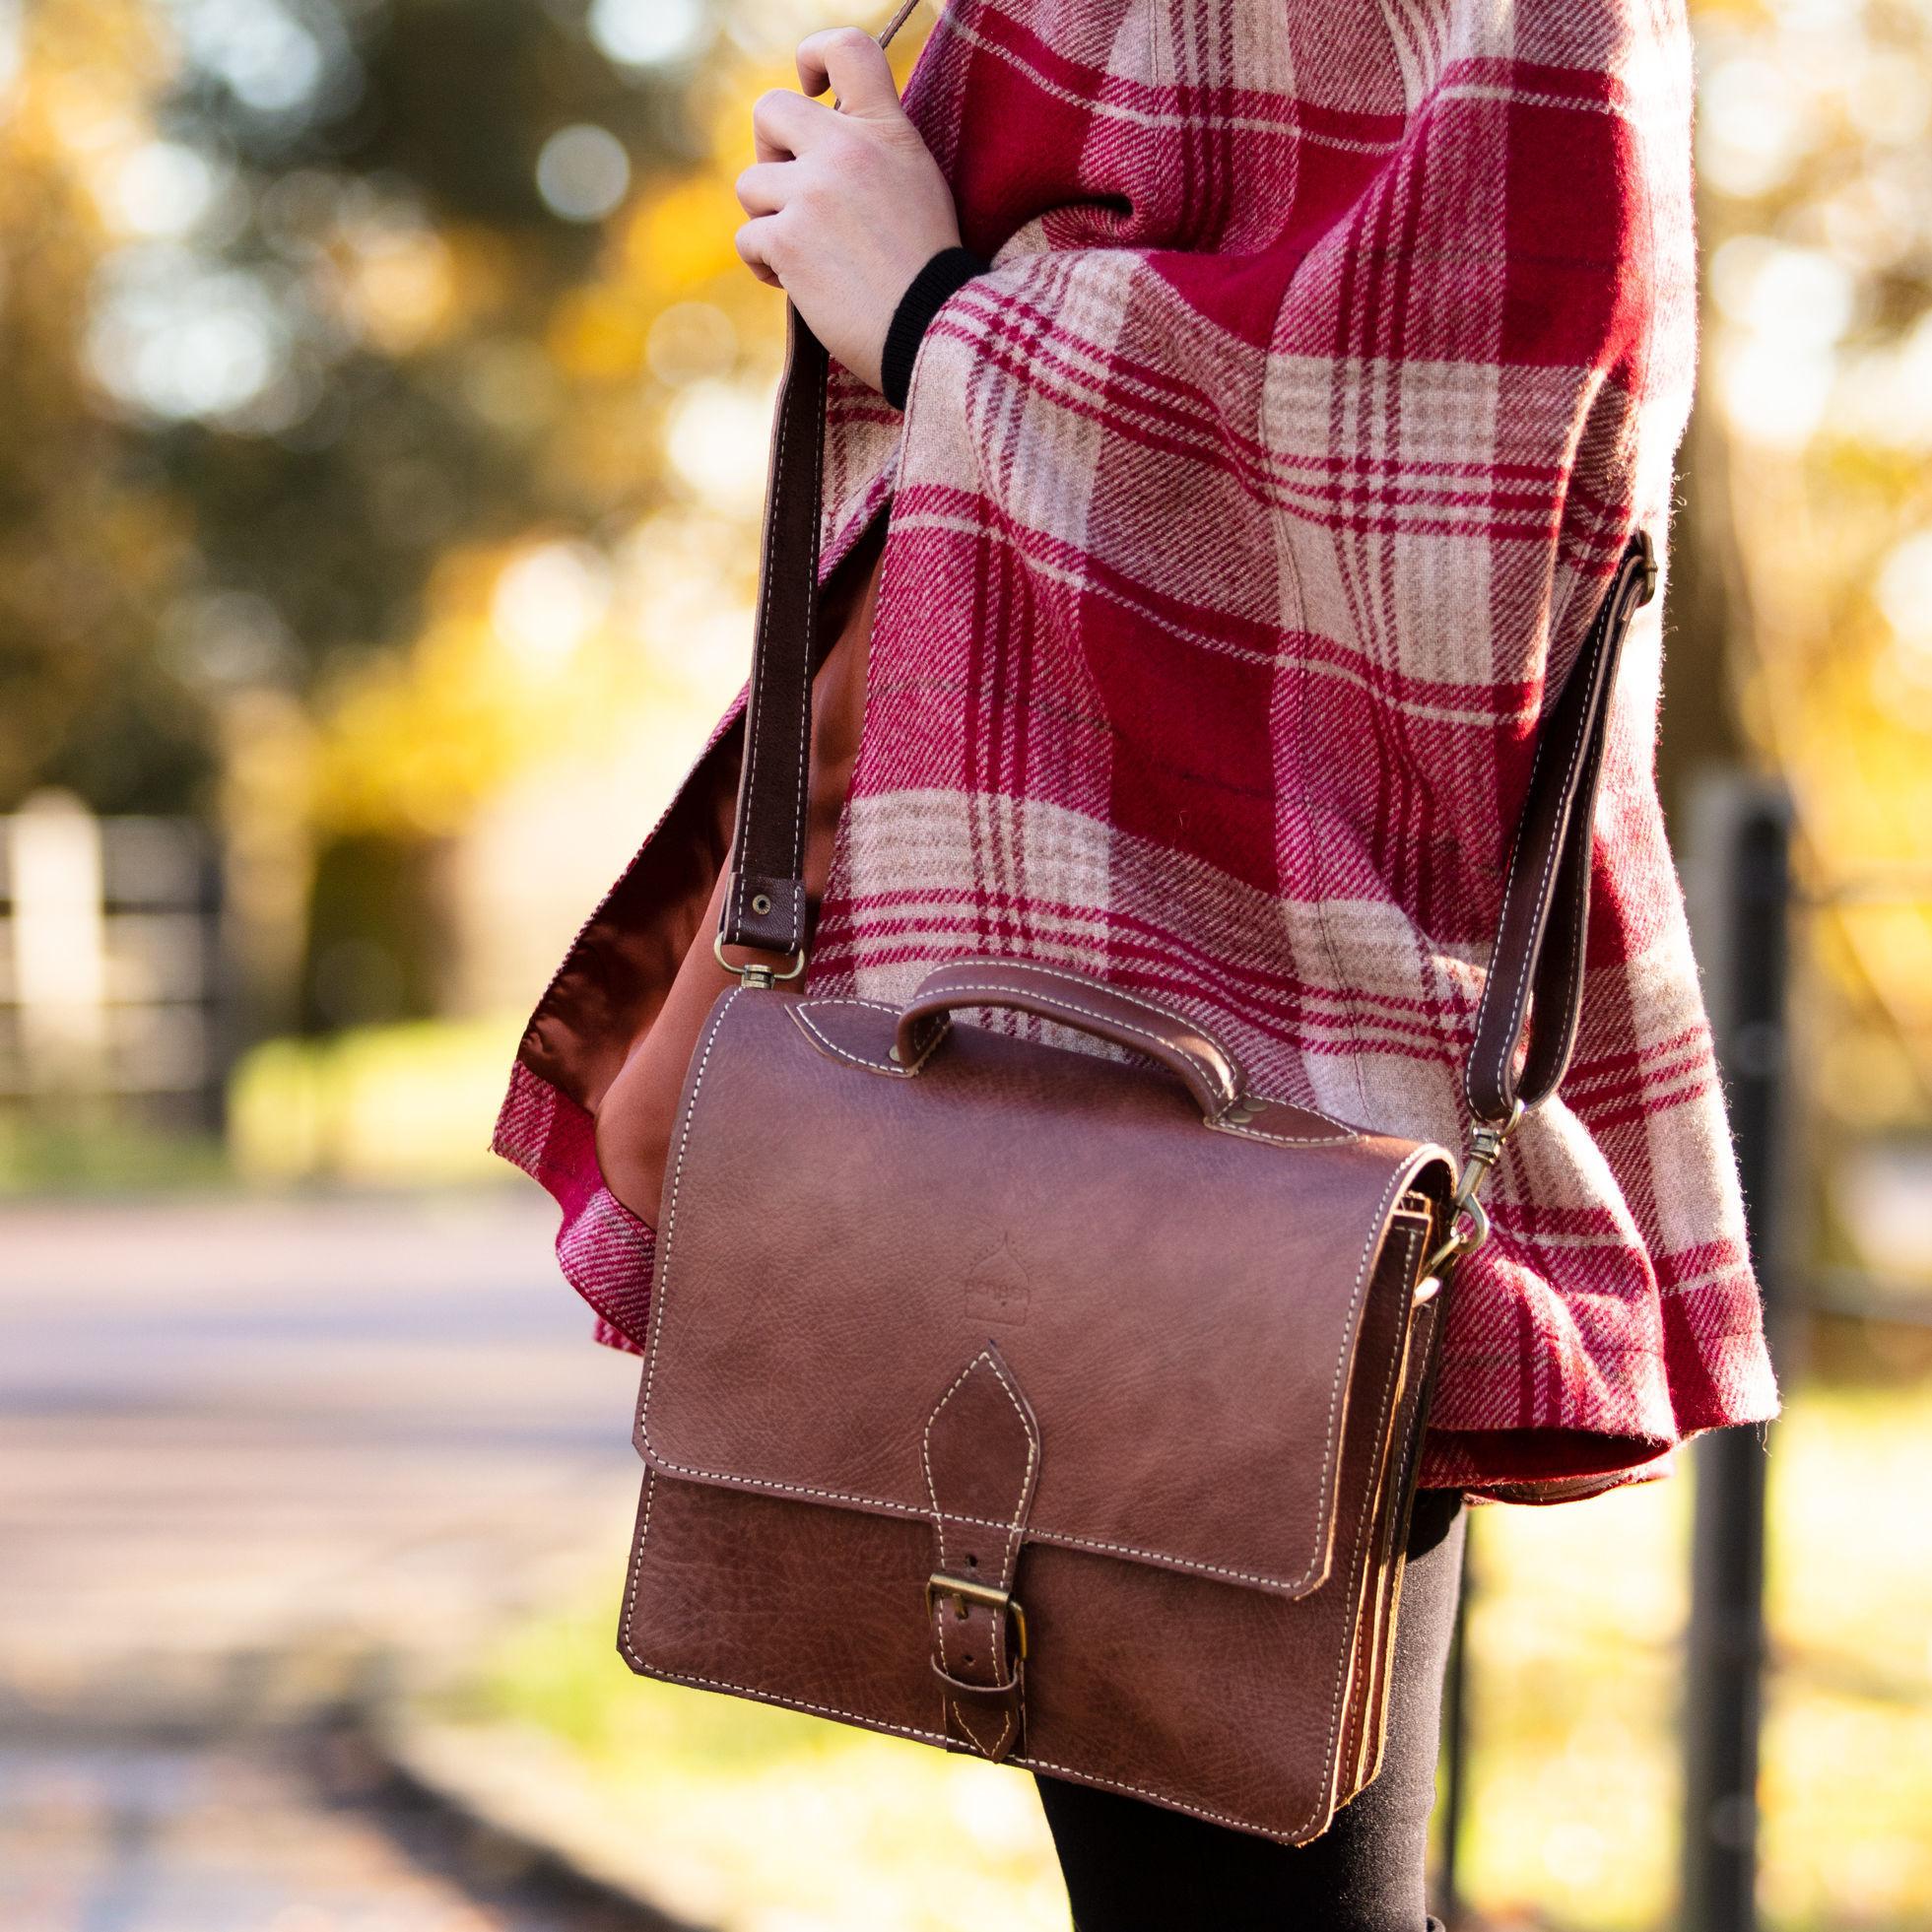 the-casablanca-mini-satchel-in-dark-brown